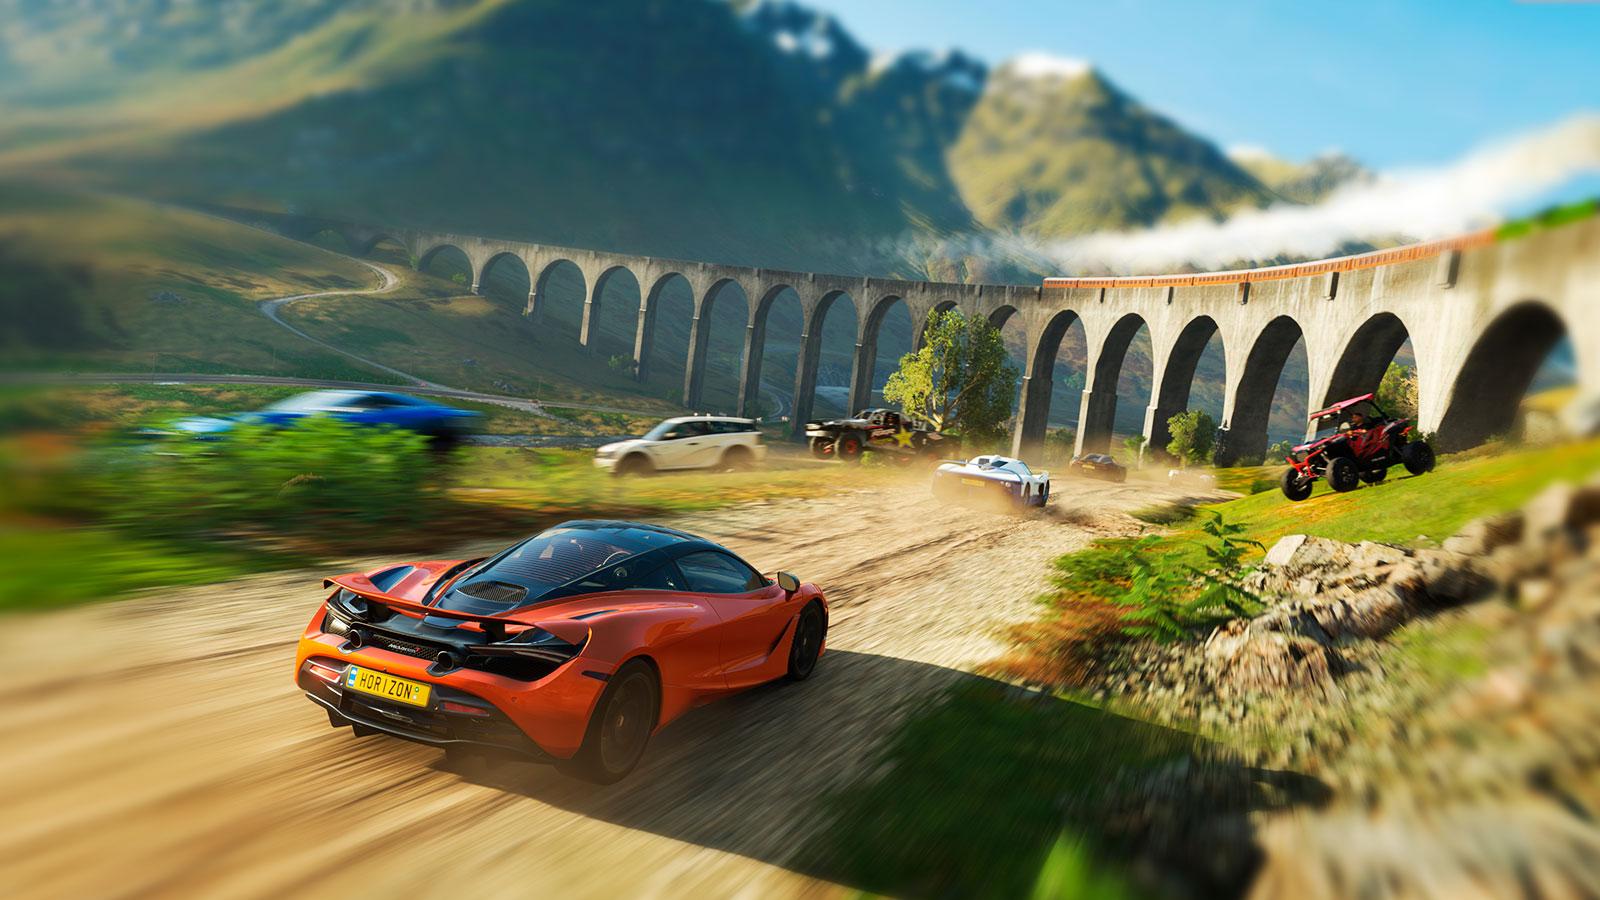 Forza Horizon 4 топ спорт игры